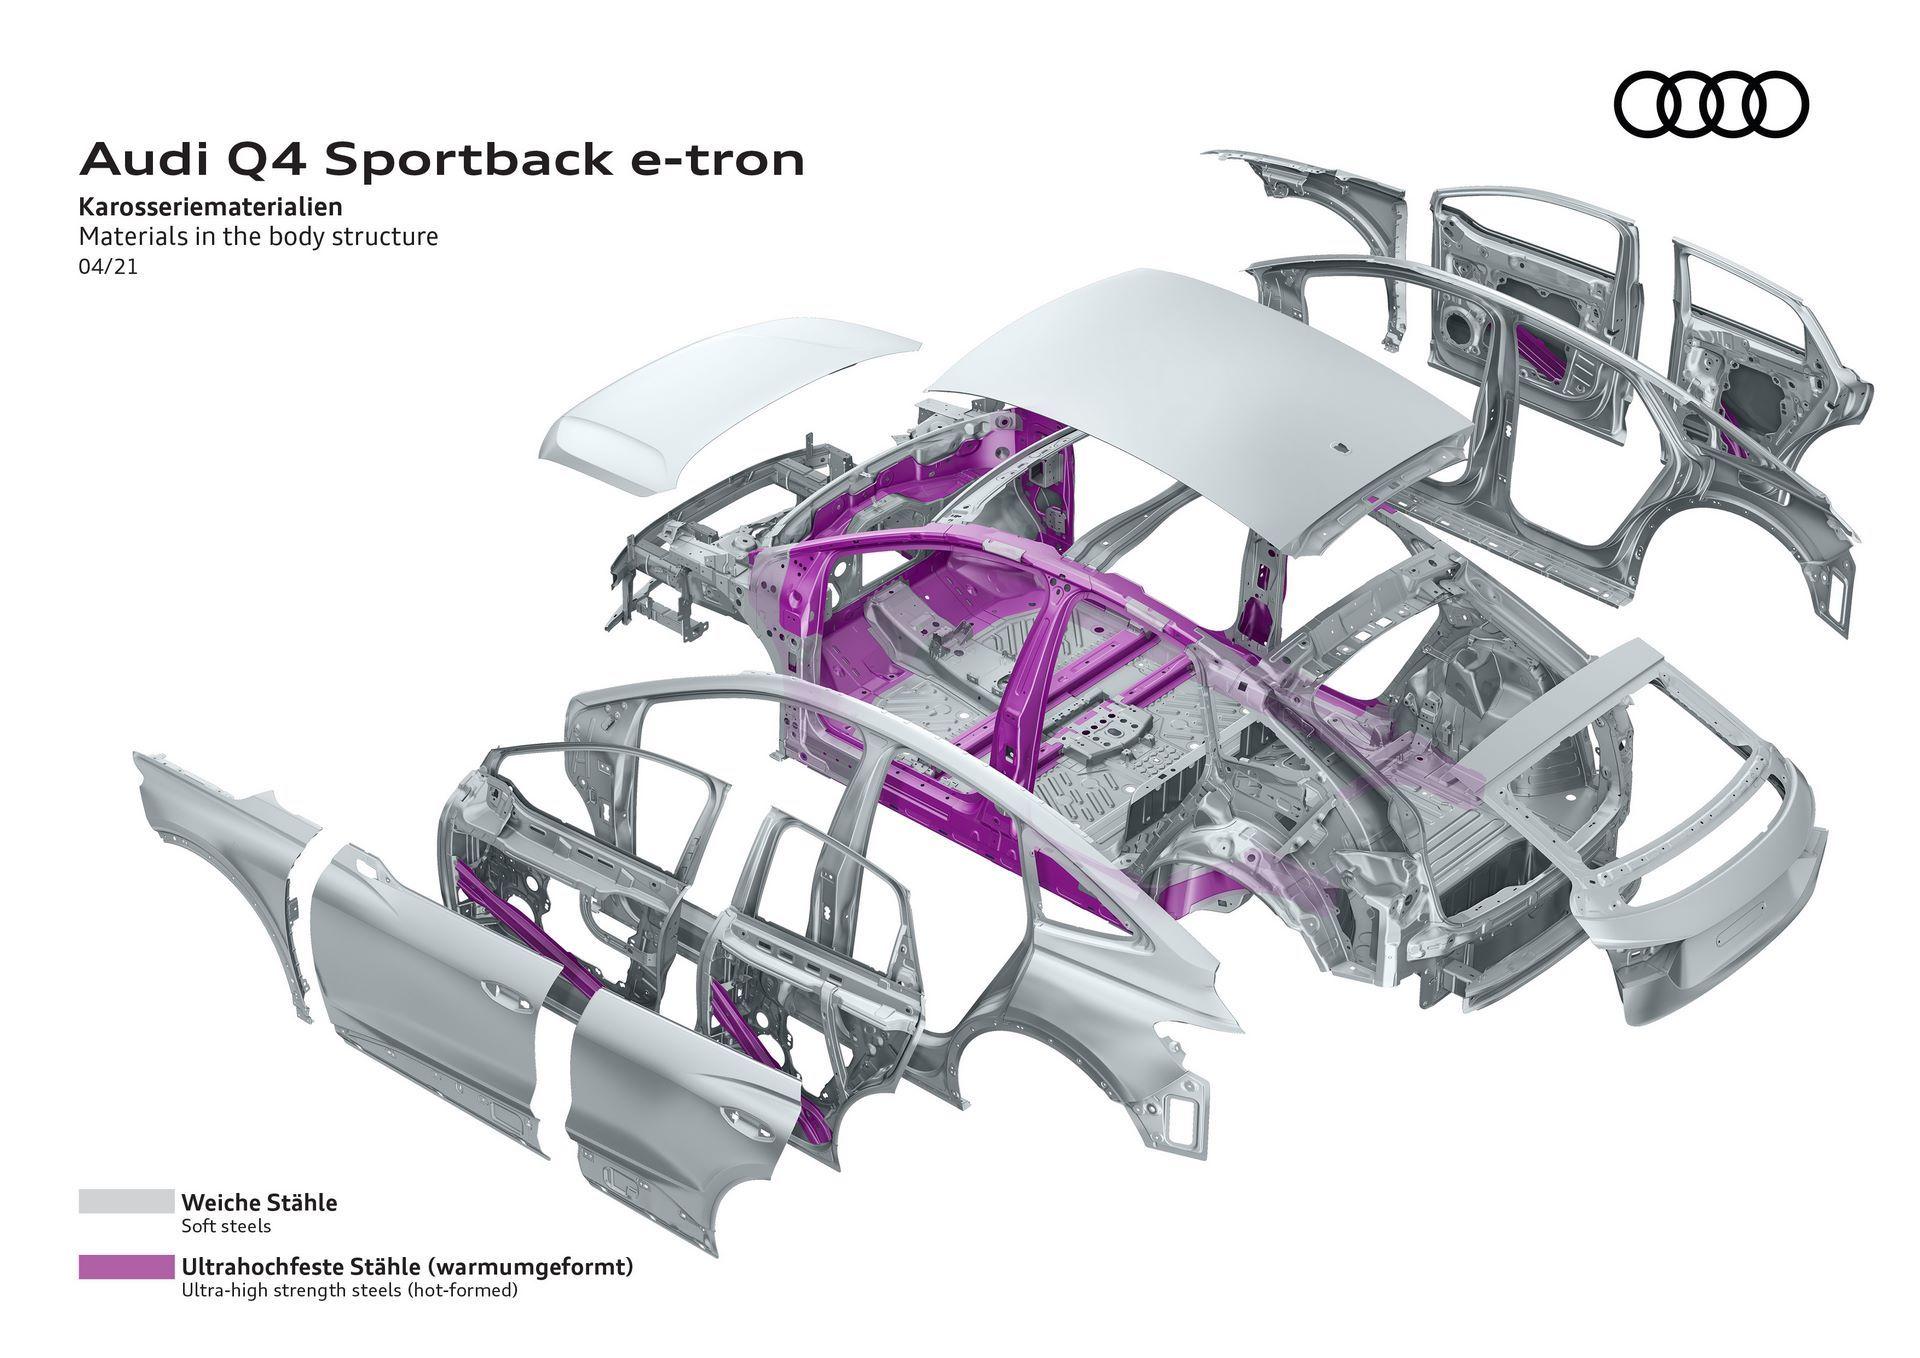 Audi-Q4-e-tron-and-Q4-e-tron-Sportback-156